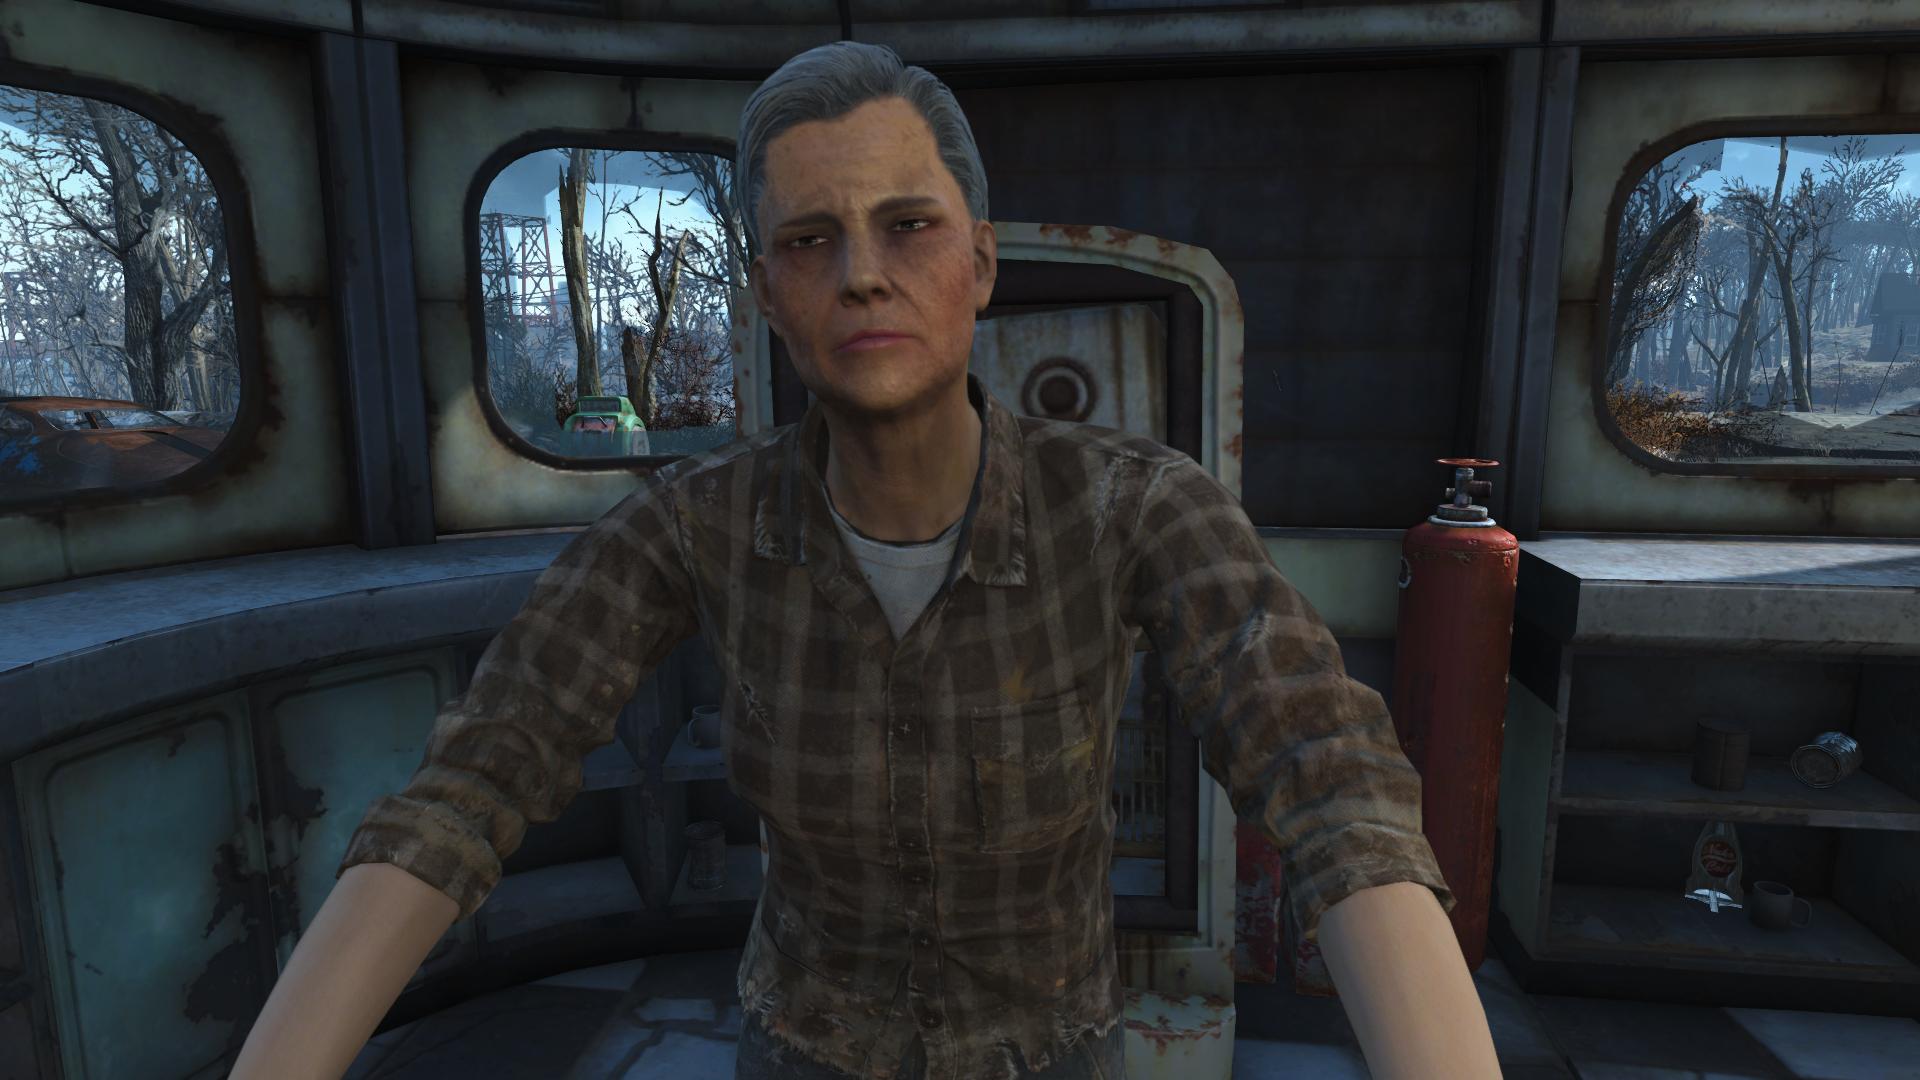 Trudy (Fallout 4)